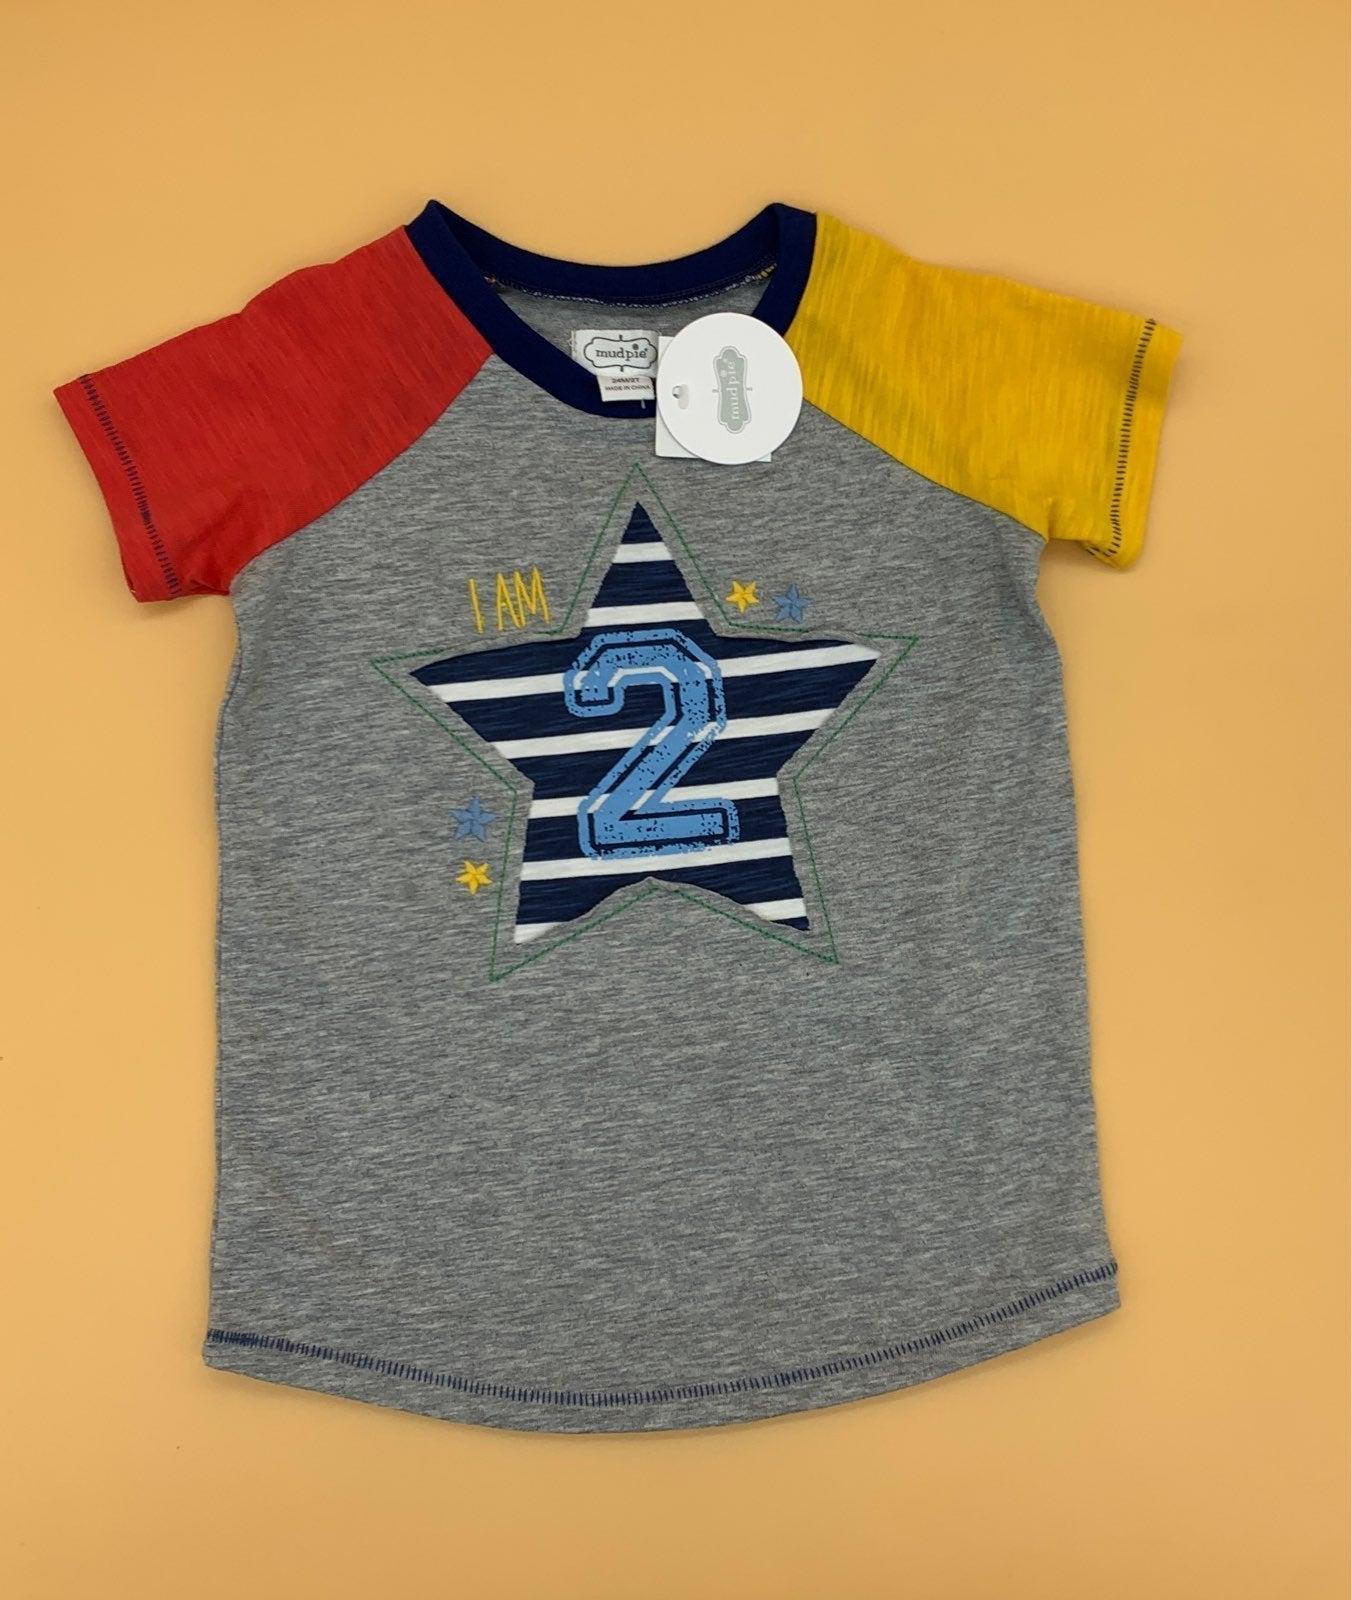 I am 2 shirt!  Mudpie - NWT 2T